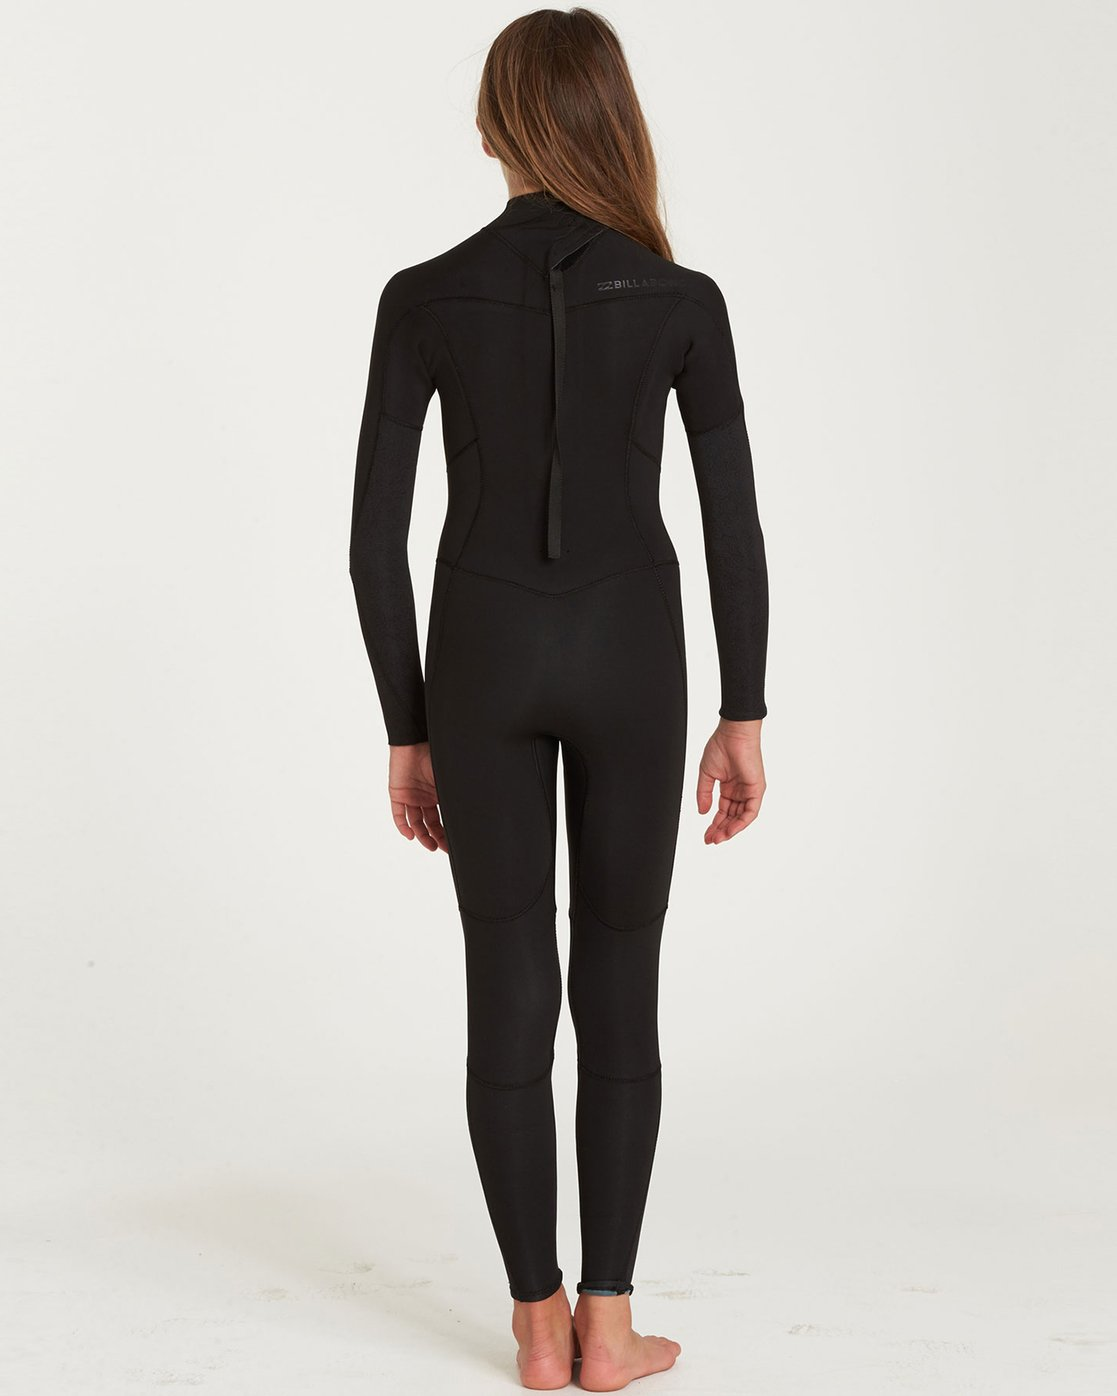 ad827803e1 2 Girls  4 3 Furnace Synergy Back Zip Fullsuit Black GWFUQBB4 Billabong